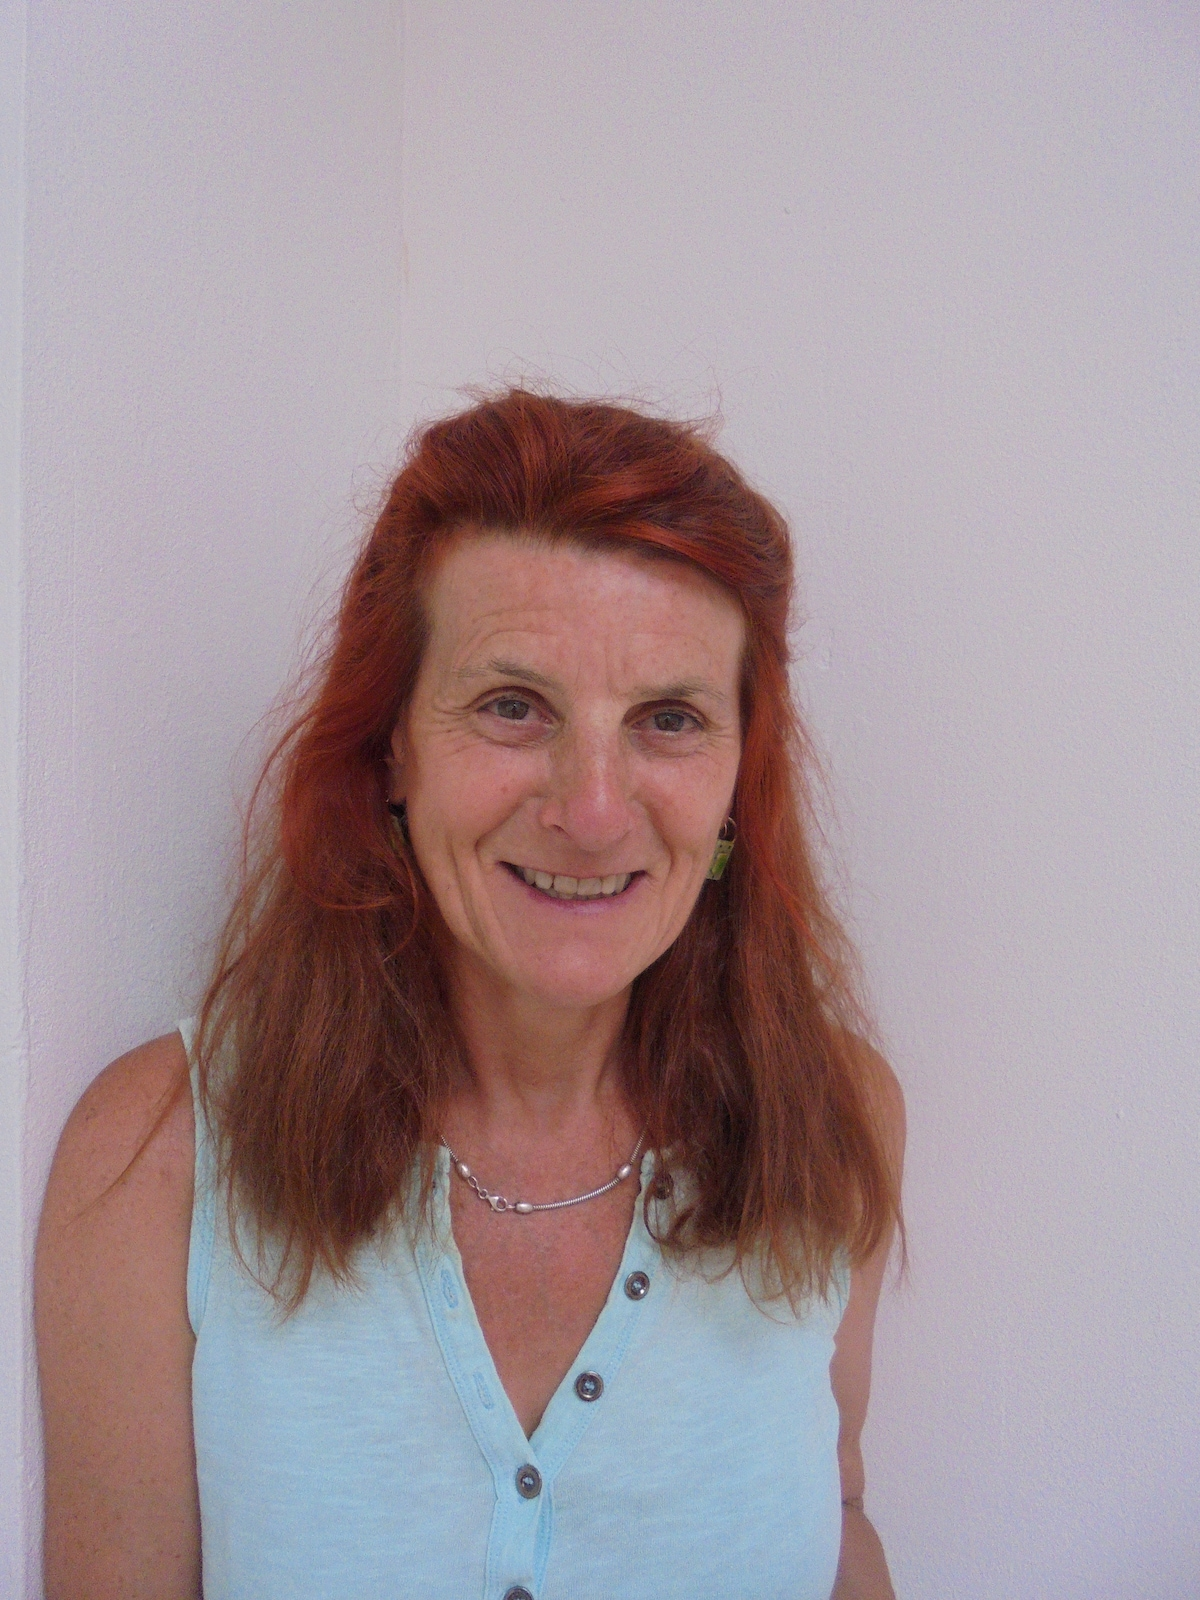 Rita from Argelès-sur-Mer